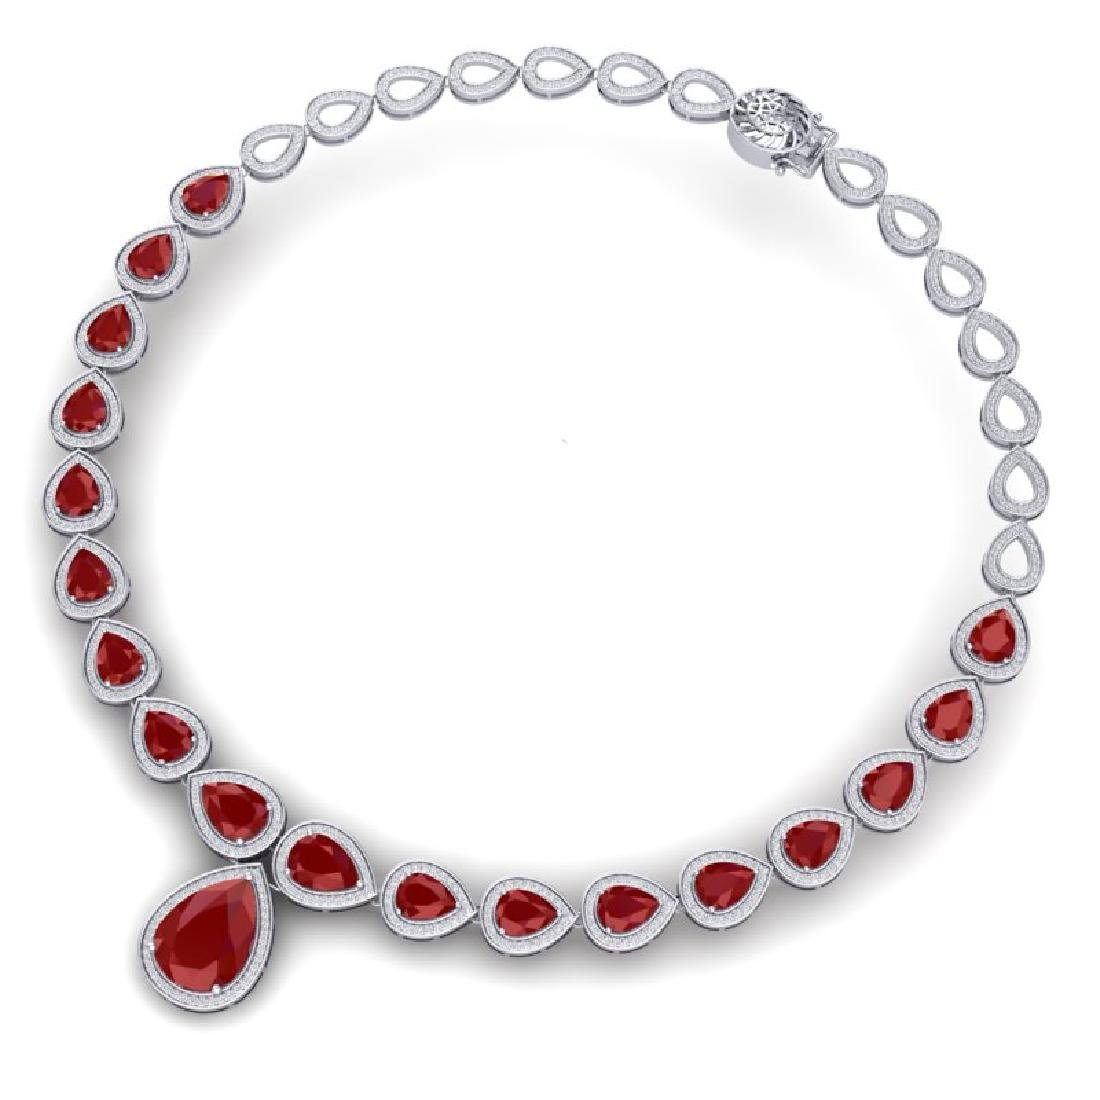 51.41 CTW Royalty Ruby & VS Diamond Necklace 18K White - 3